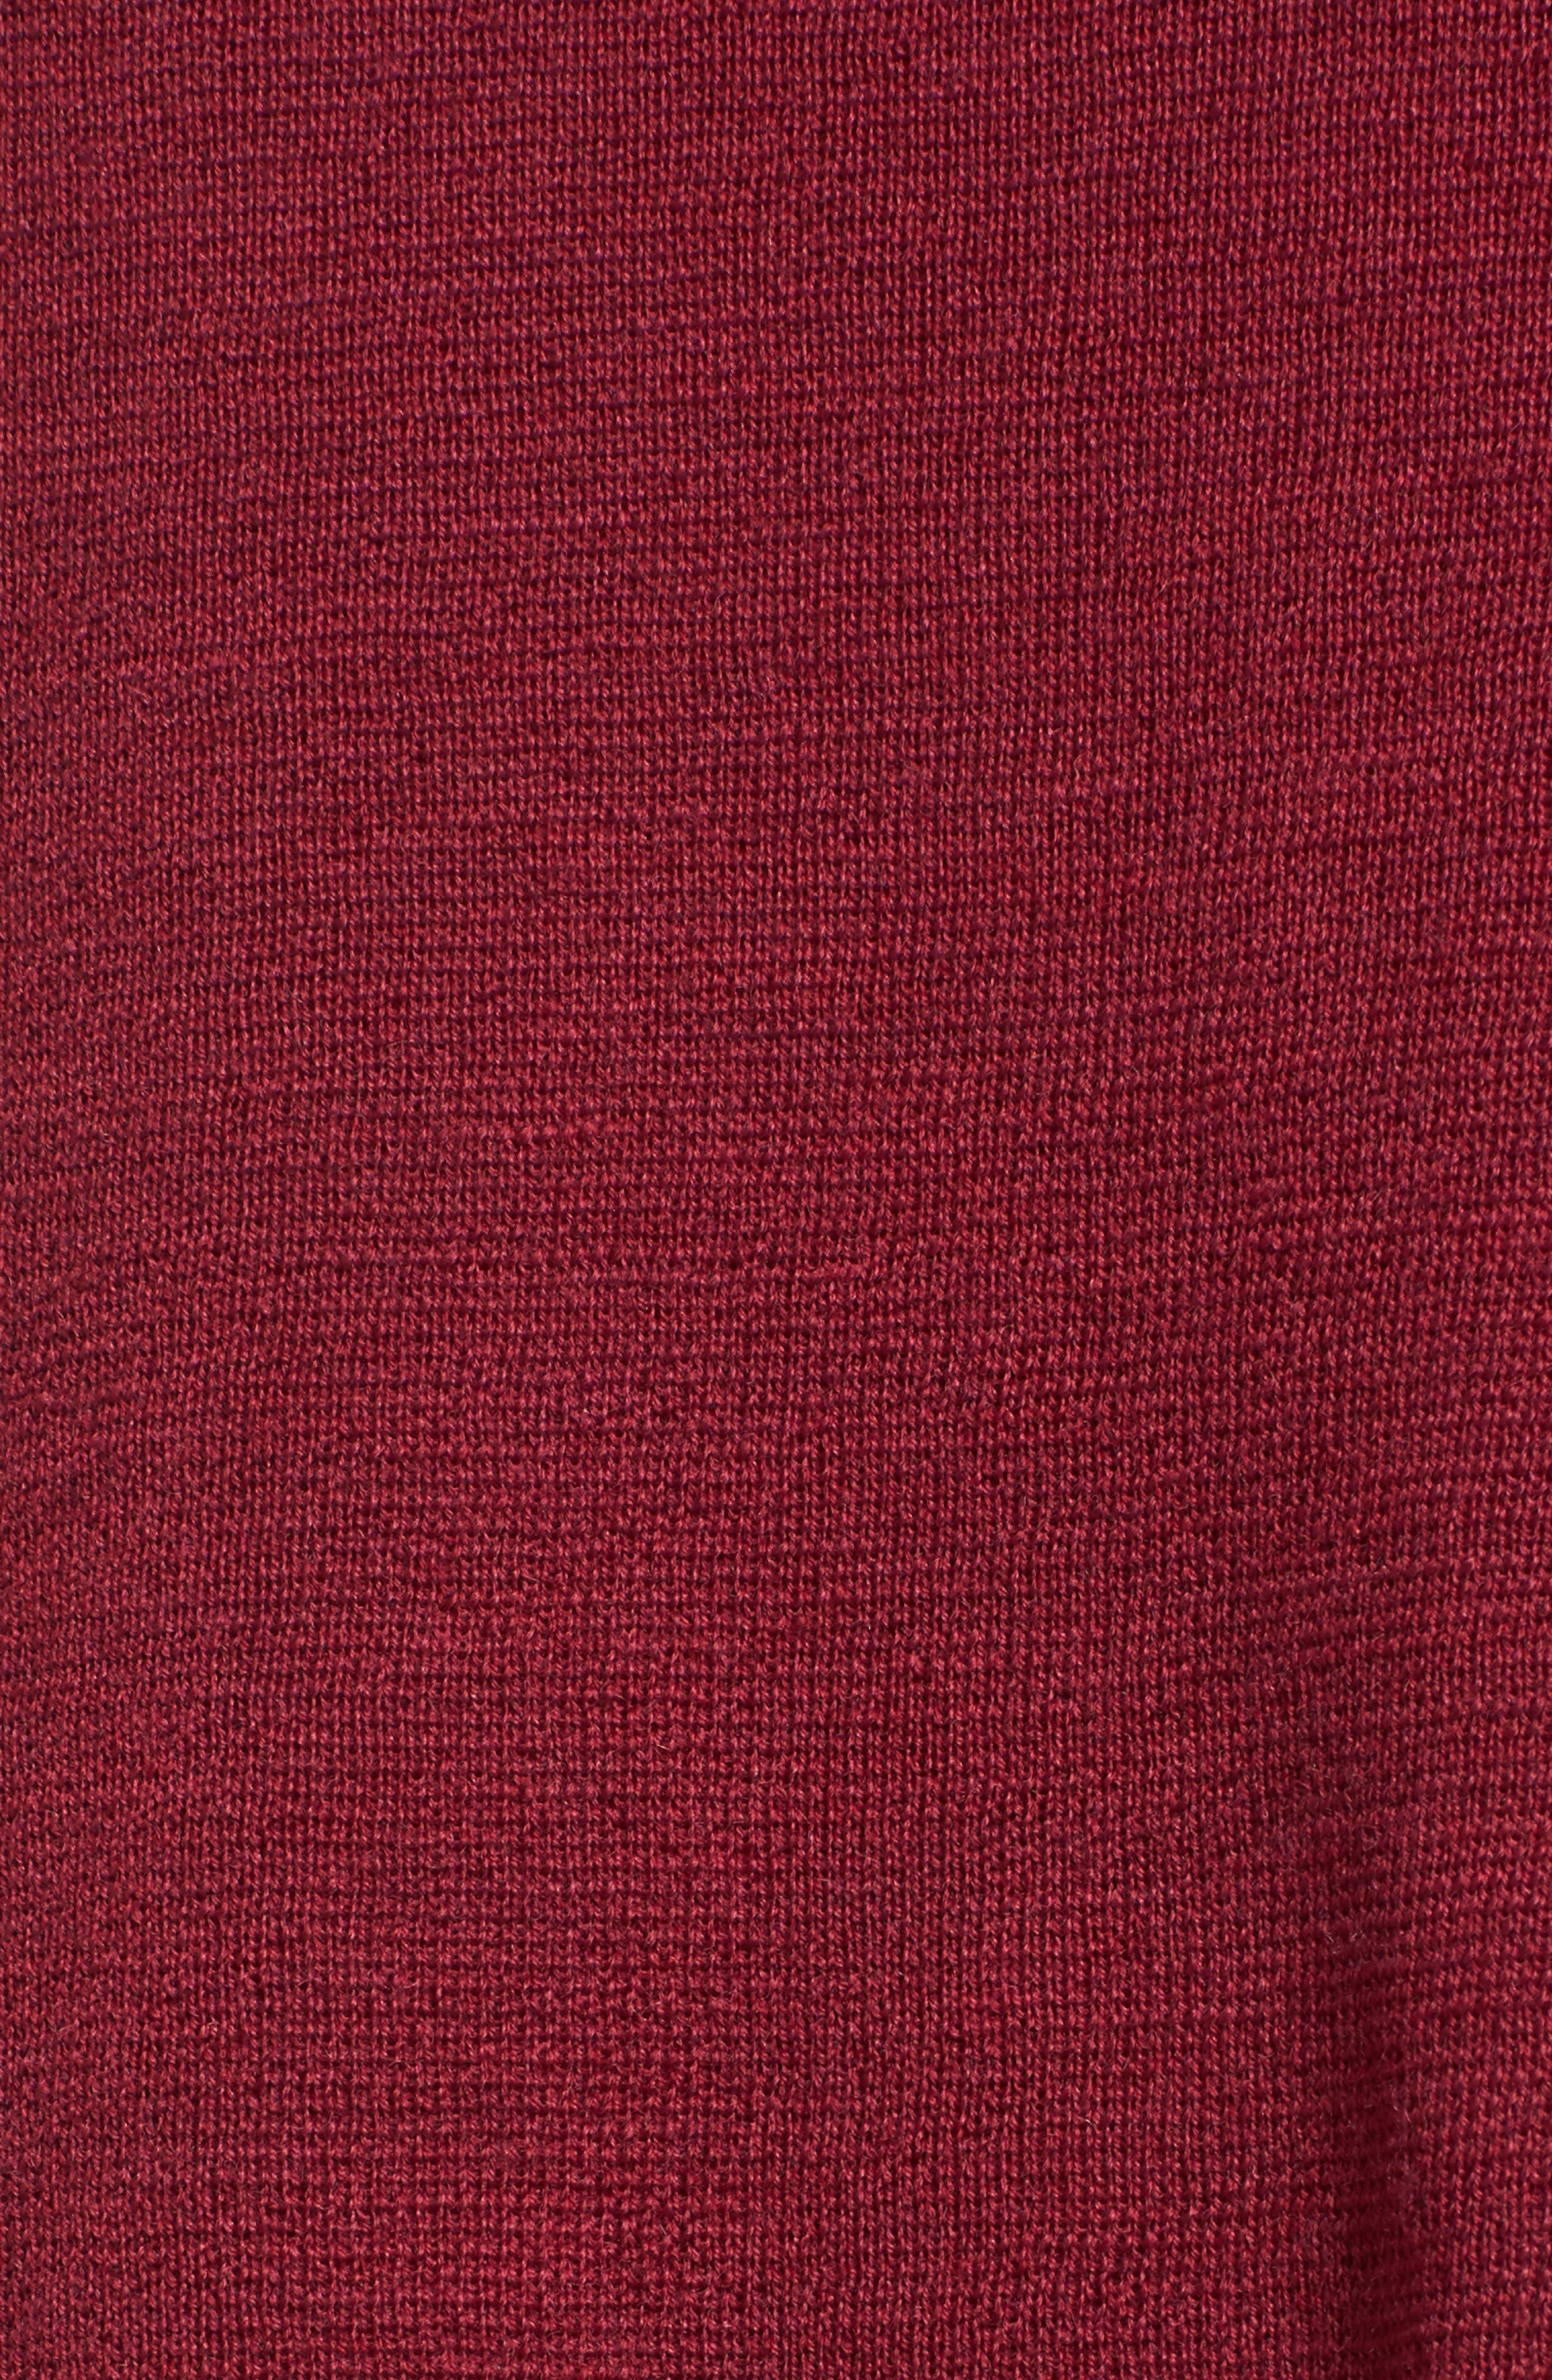 Merino Wool Sweater Dress,                             Alternate thumbnail 20, color,